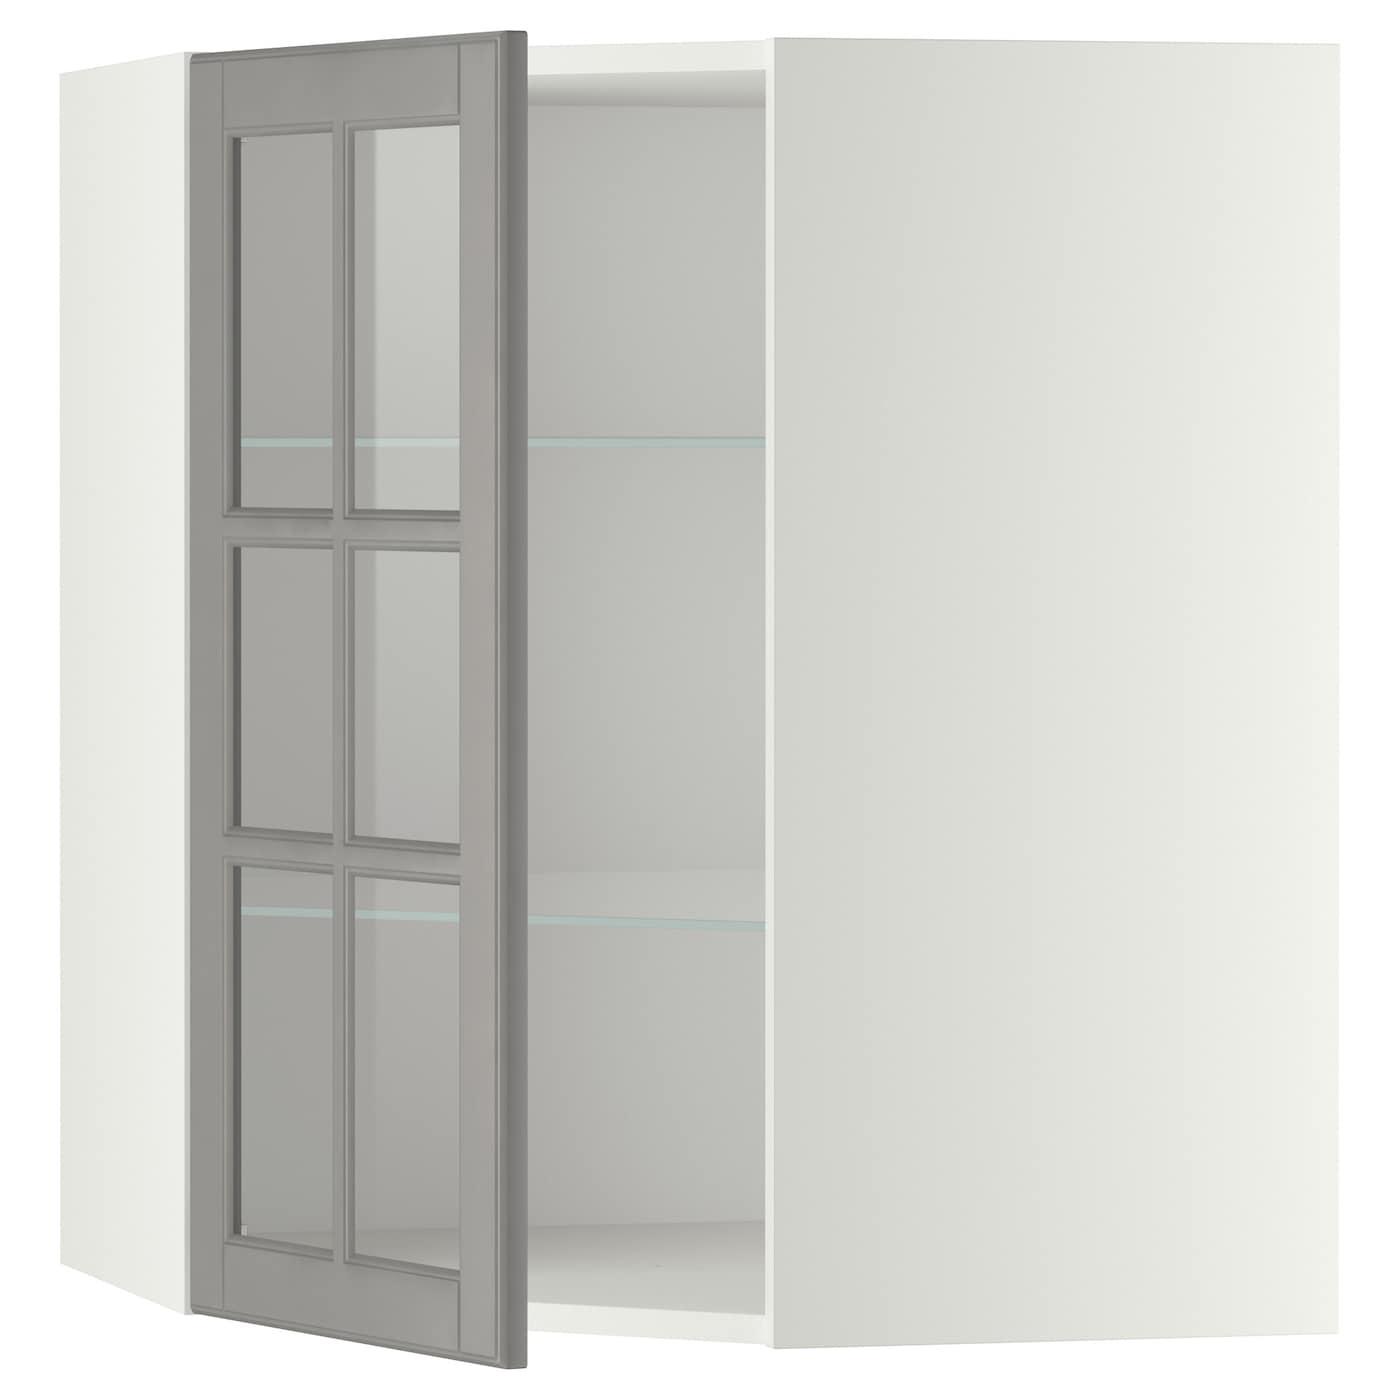 Ikea Bodbyn Kitchen Ikea Bodbyn Kitchen Grey And White: METOD Corner Wall Cab W Shelves/glass Dr White/bodbyn Grey